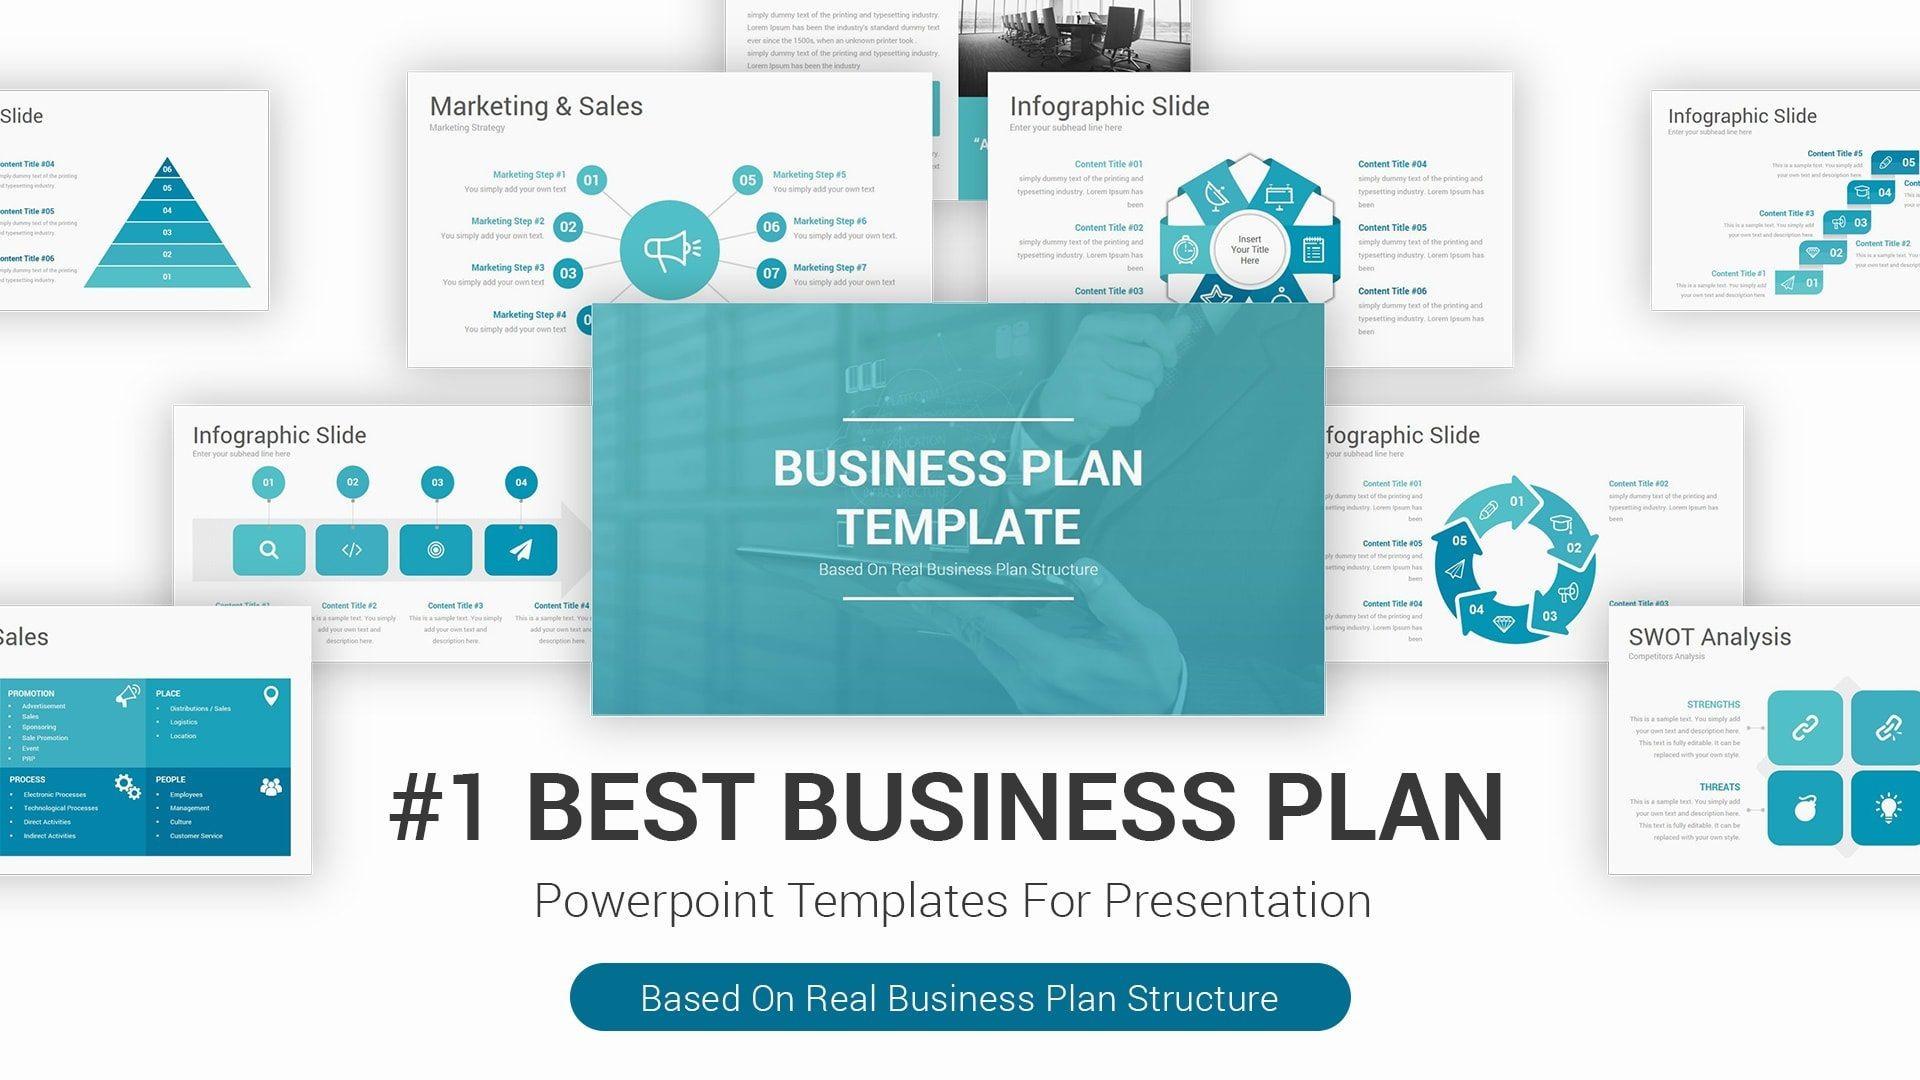 006 Striking Best Busines Plan Template Photo  Ppt Free Download1920